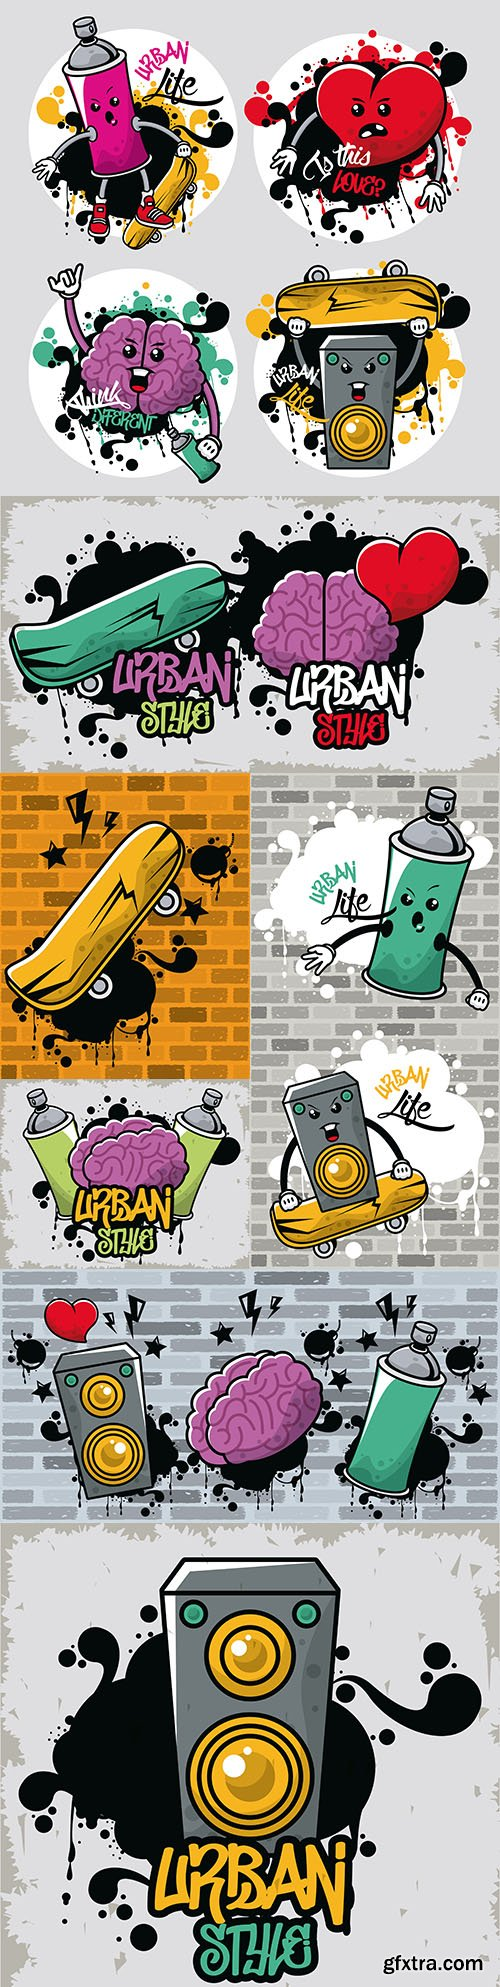 Urban style graffiti with skateboarding and brain